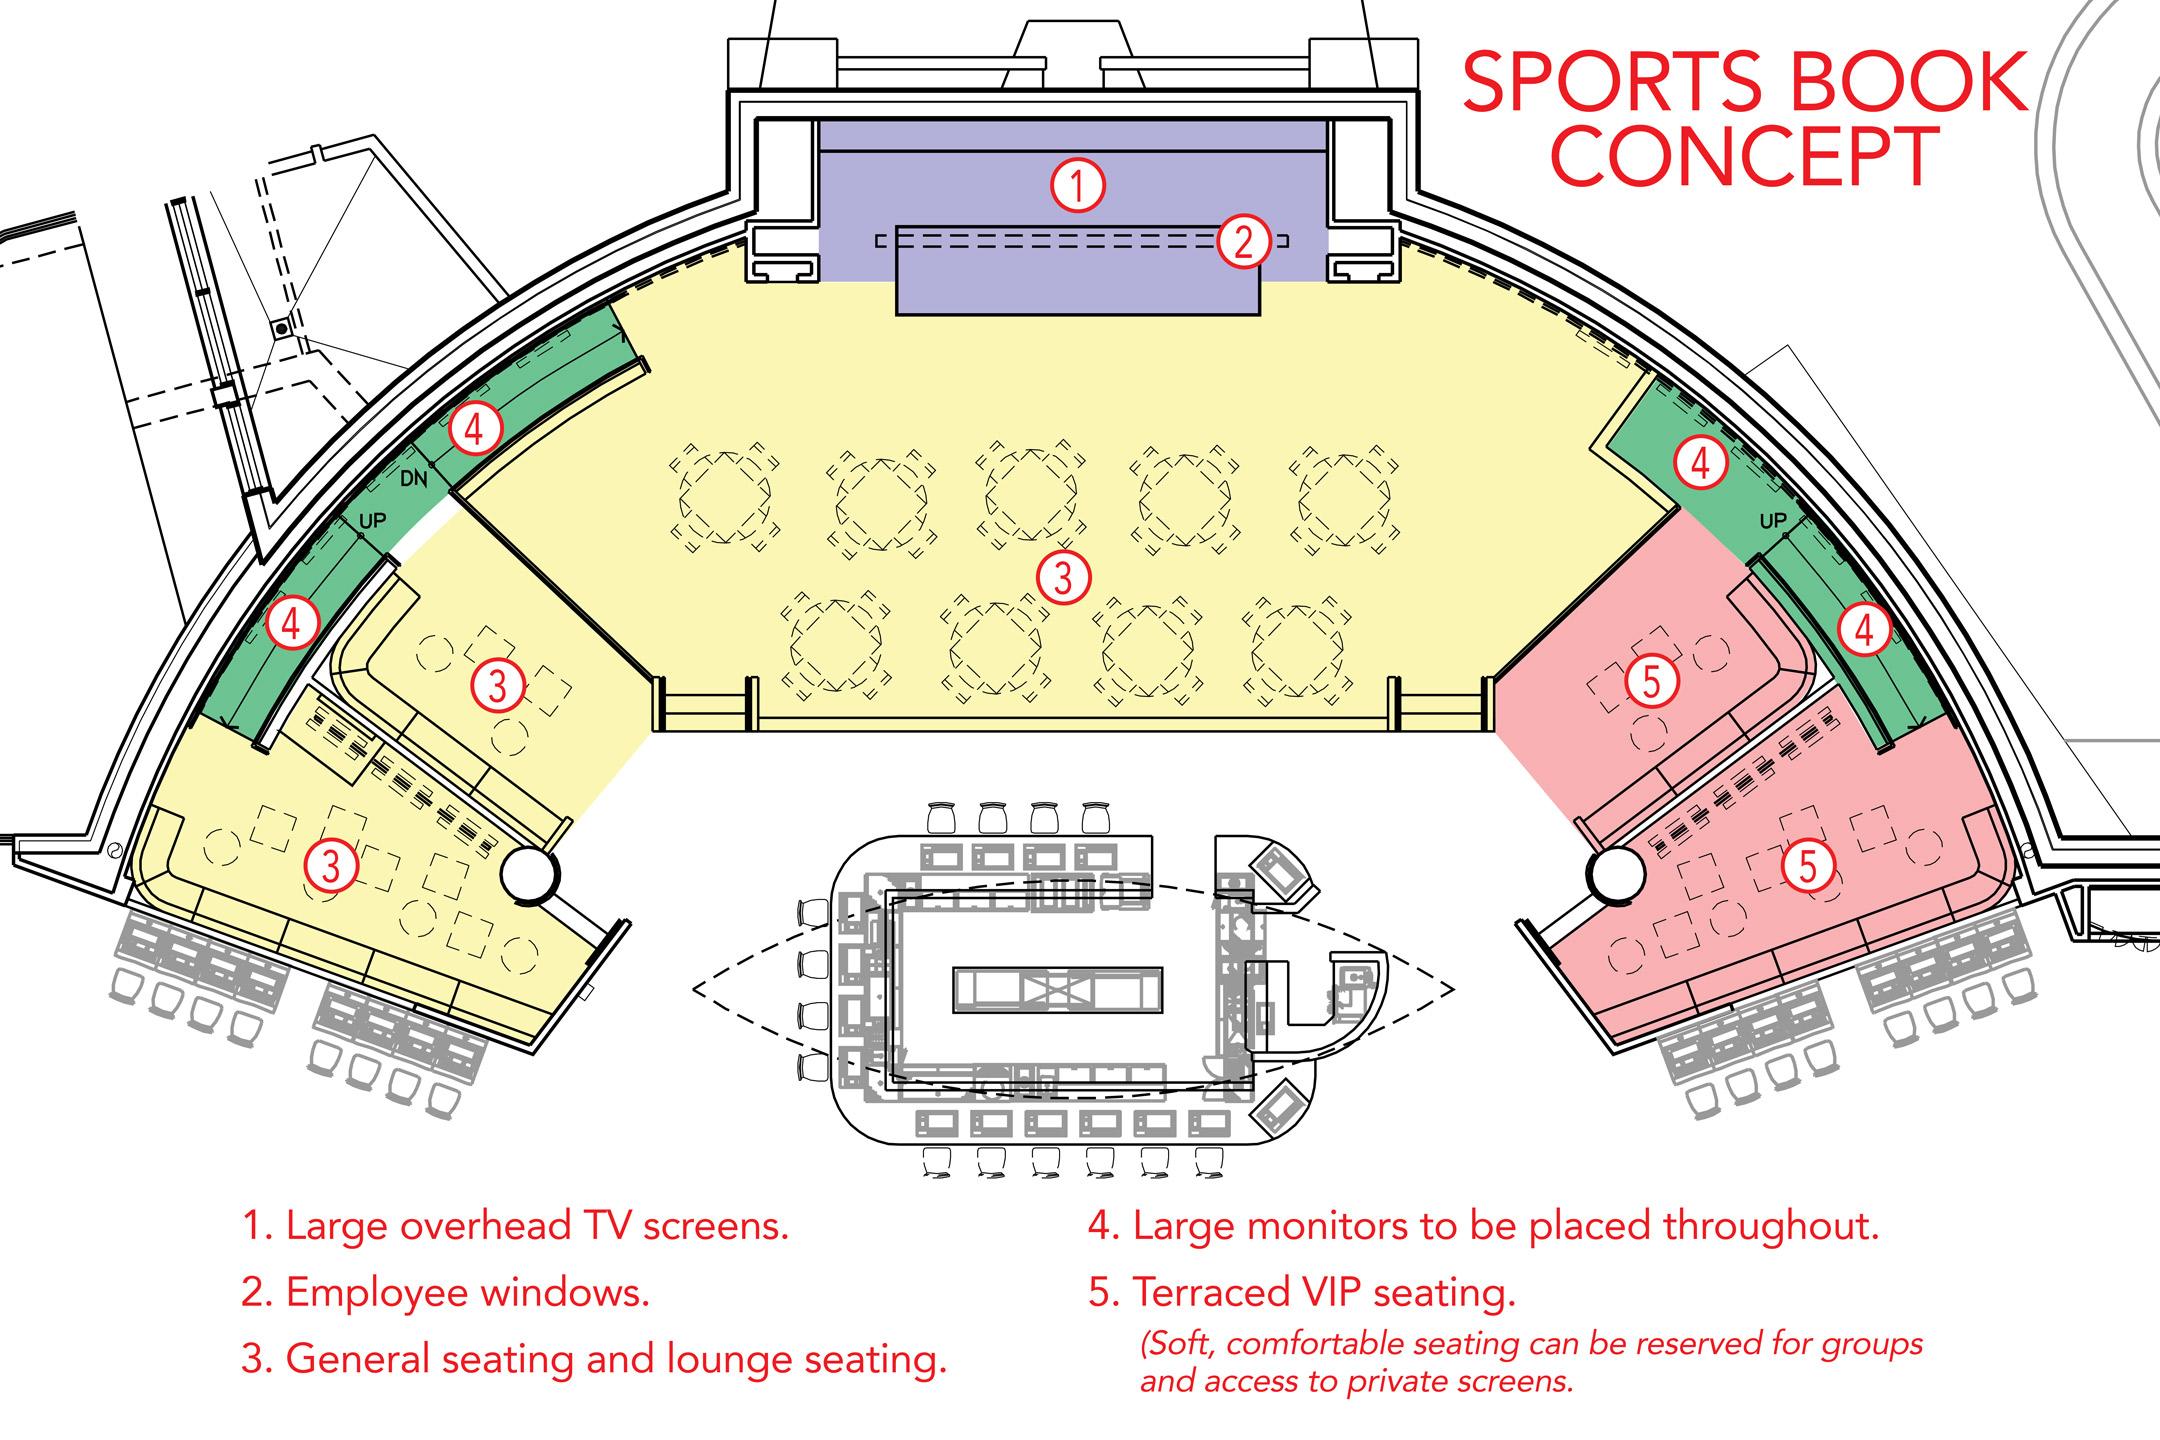 GF_SportsBookConcept_1560474763405.jpg